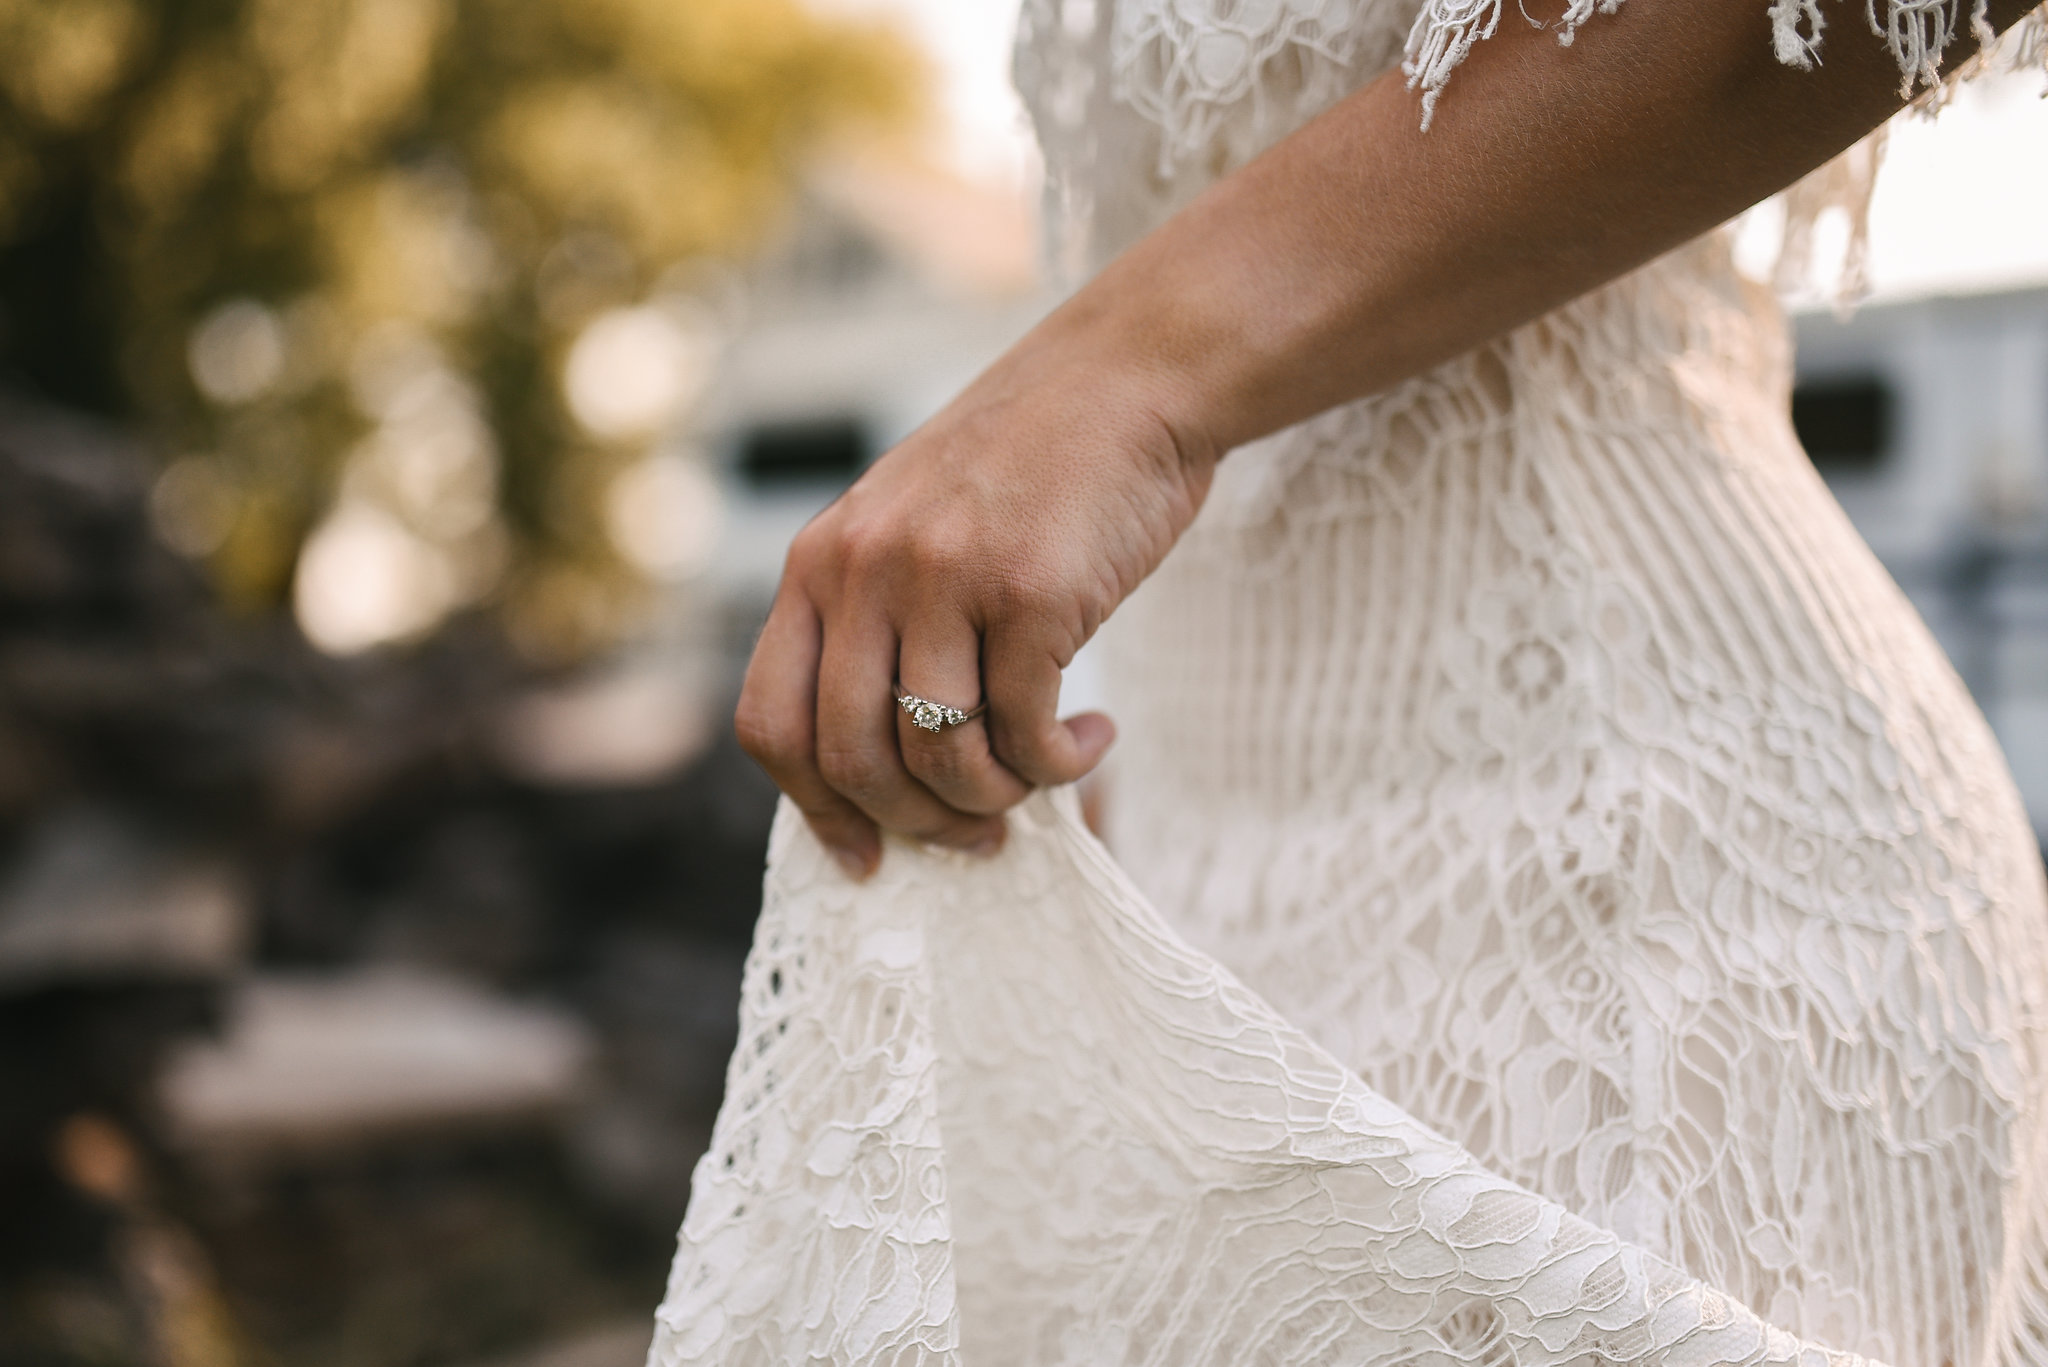 Maryland, Eastern Shore, Baltimore Wedding Photographer, Romantic, Boho, Backyard Wedding, Nature, Detail Photo of Engagement Ring and Lace Wedding Dress, Daughters of Simone Dress